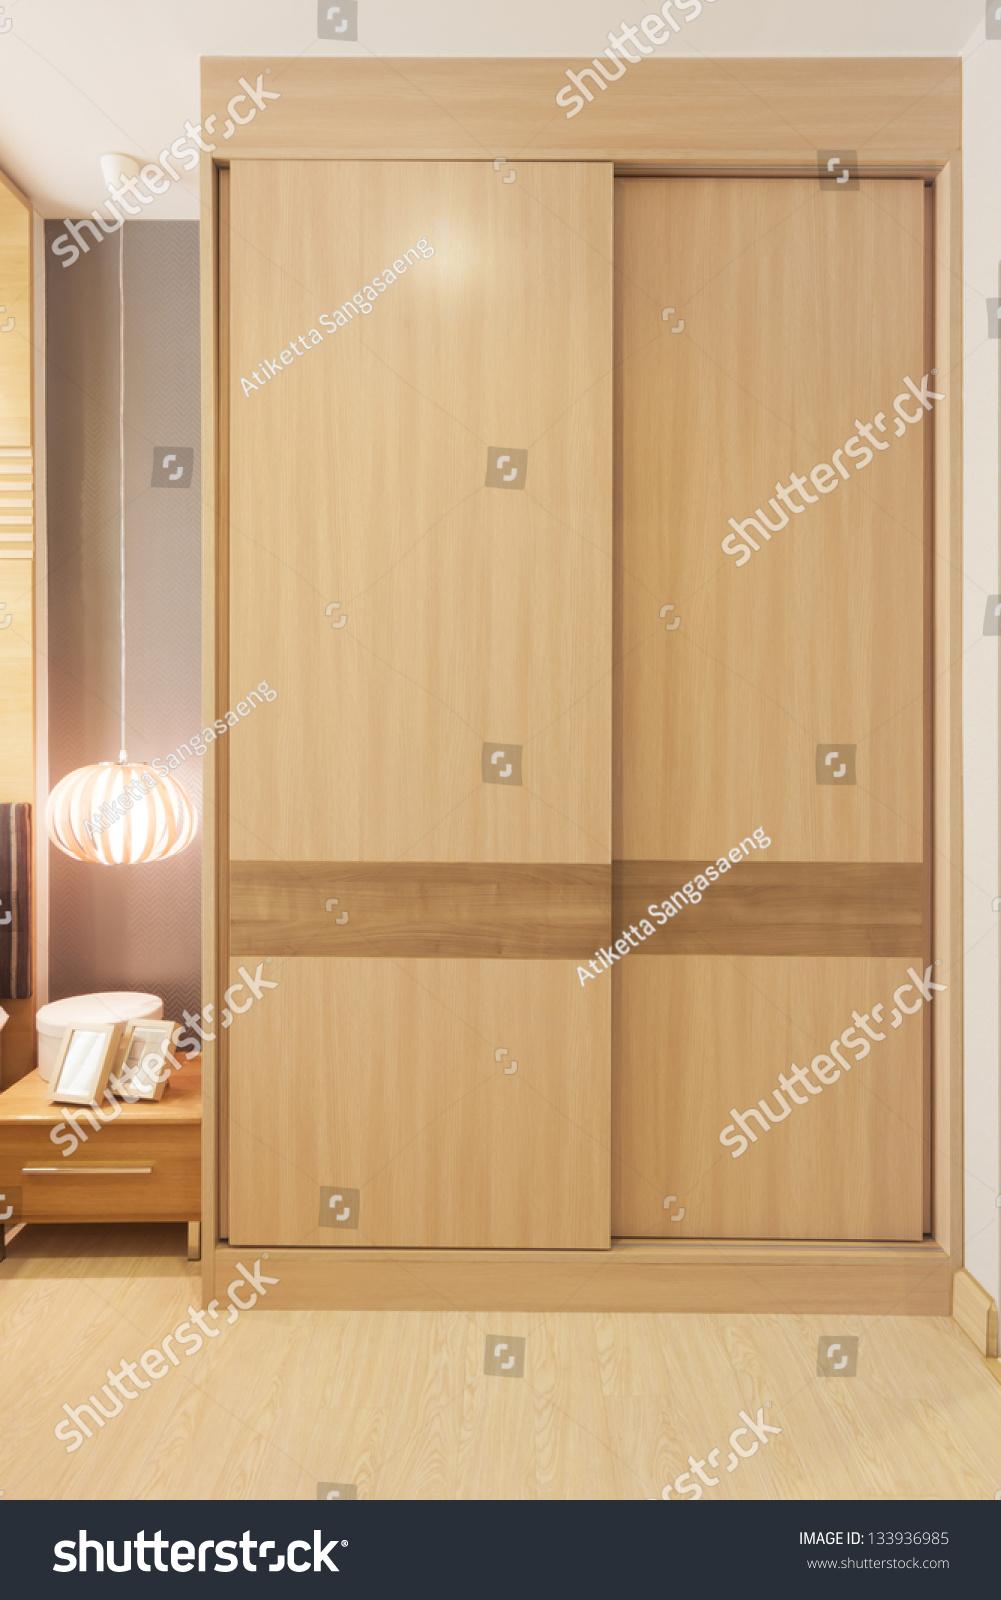 Stock Room Doors : Sliding doors wardrobe furnishing small room stock photo